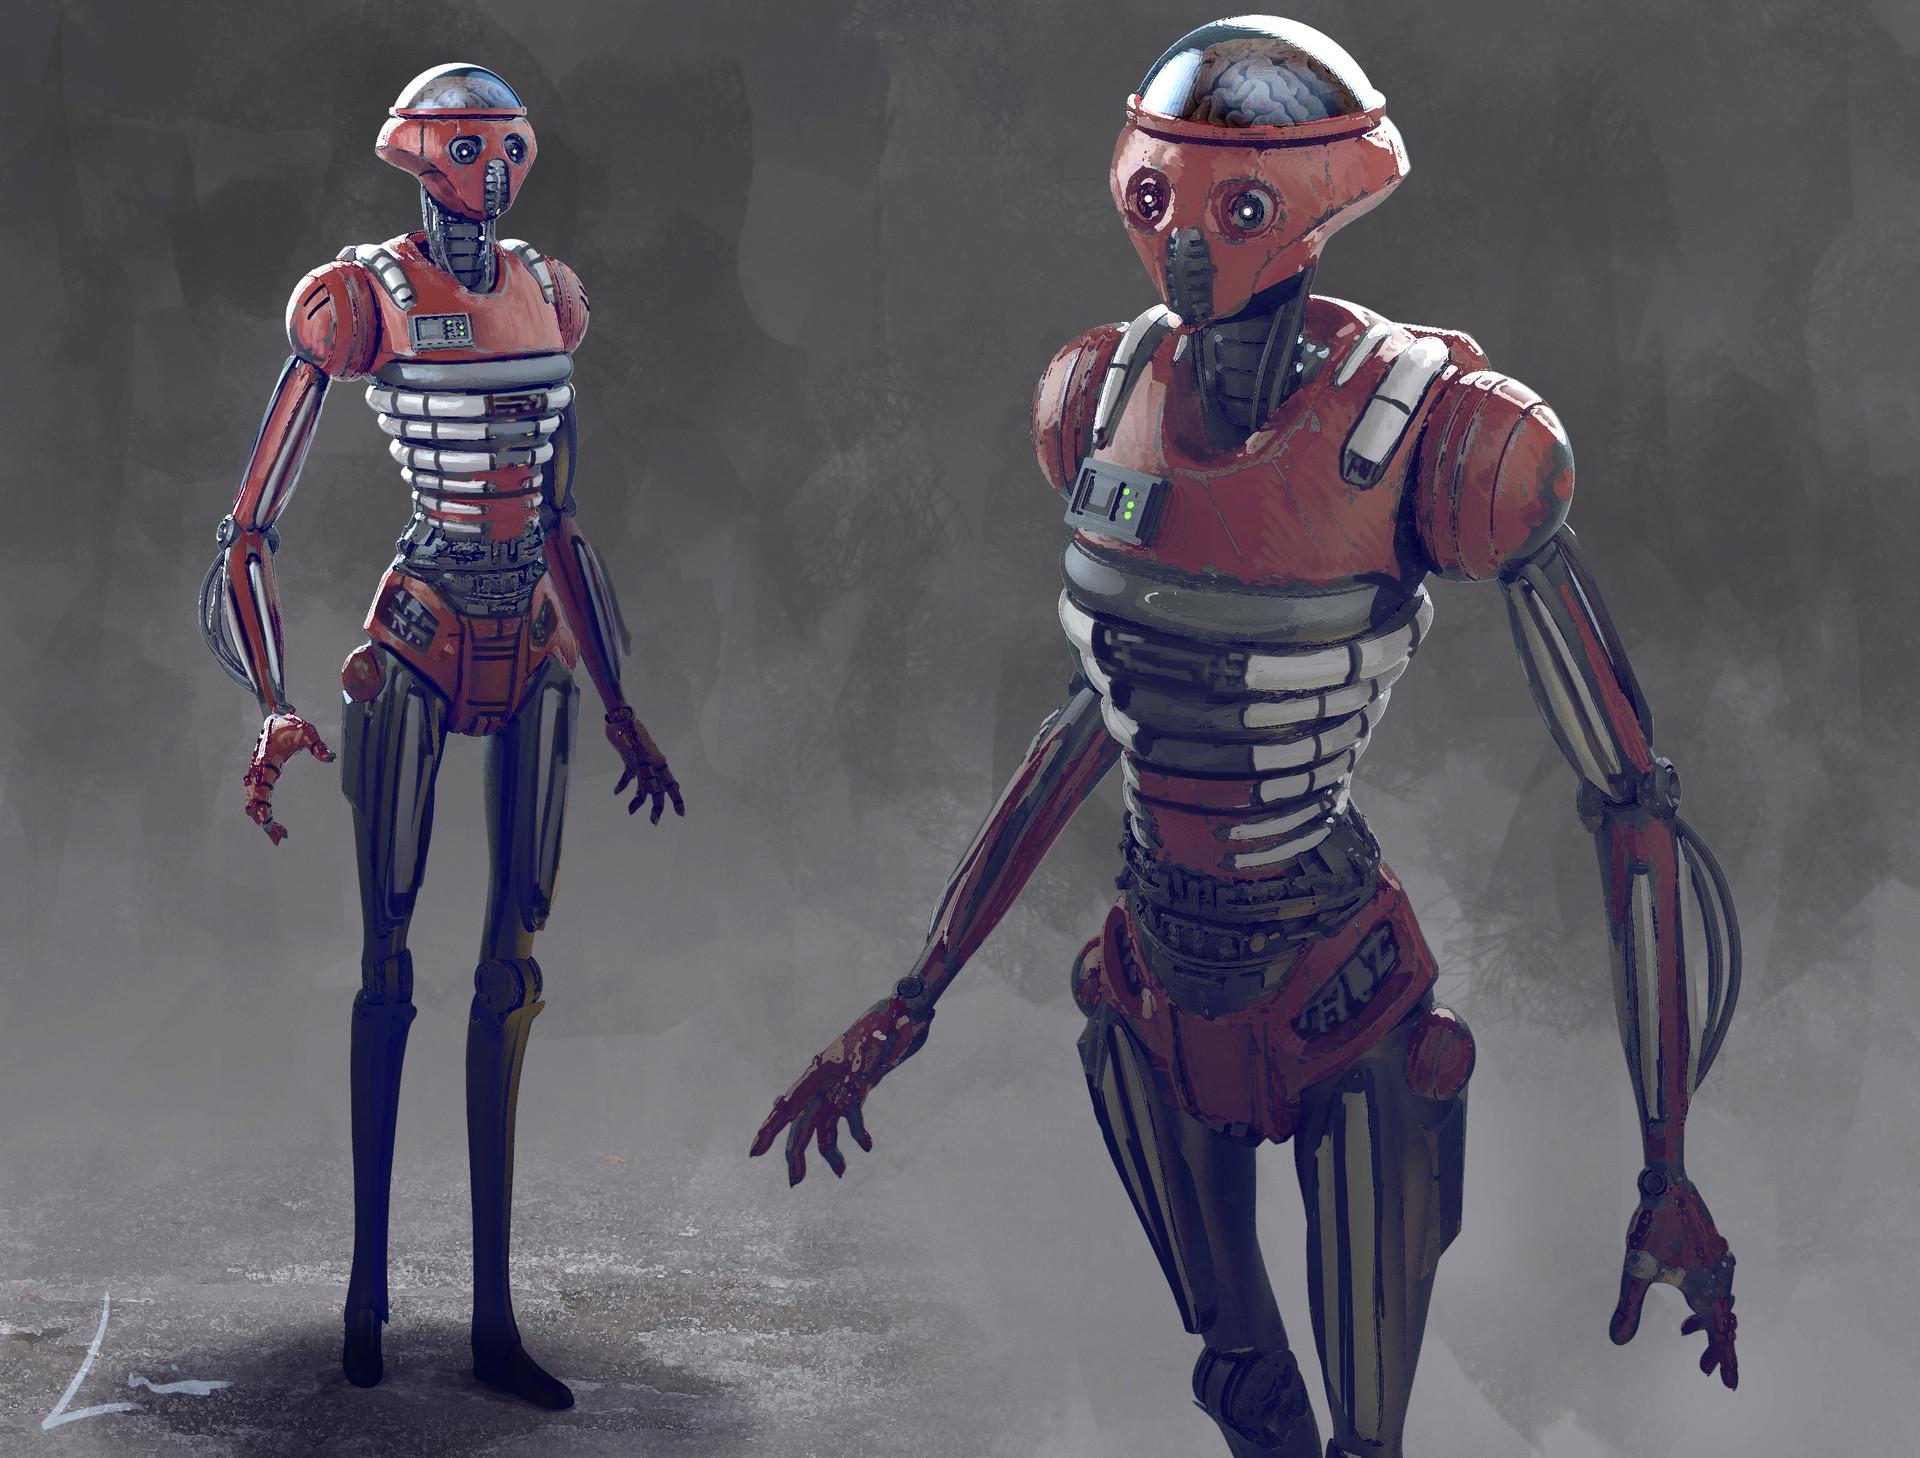 luis-carrasco-redcup-droid-03-lc.jpg?152